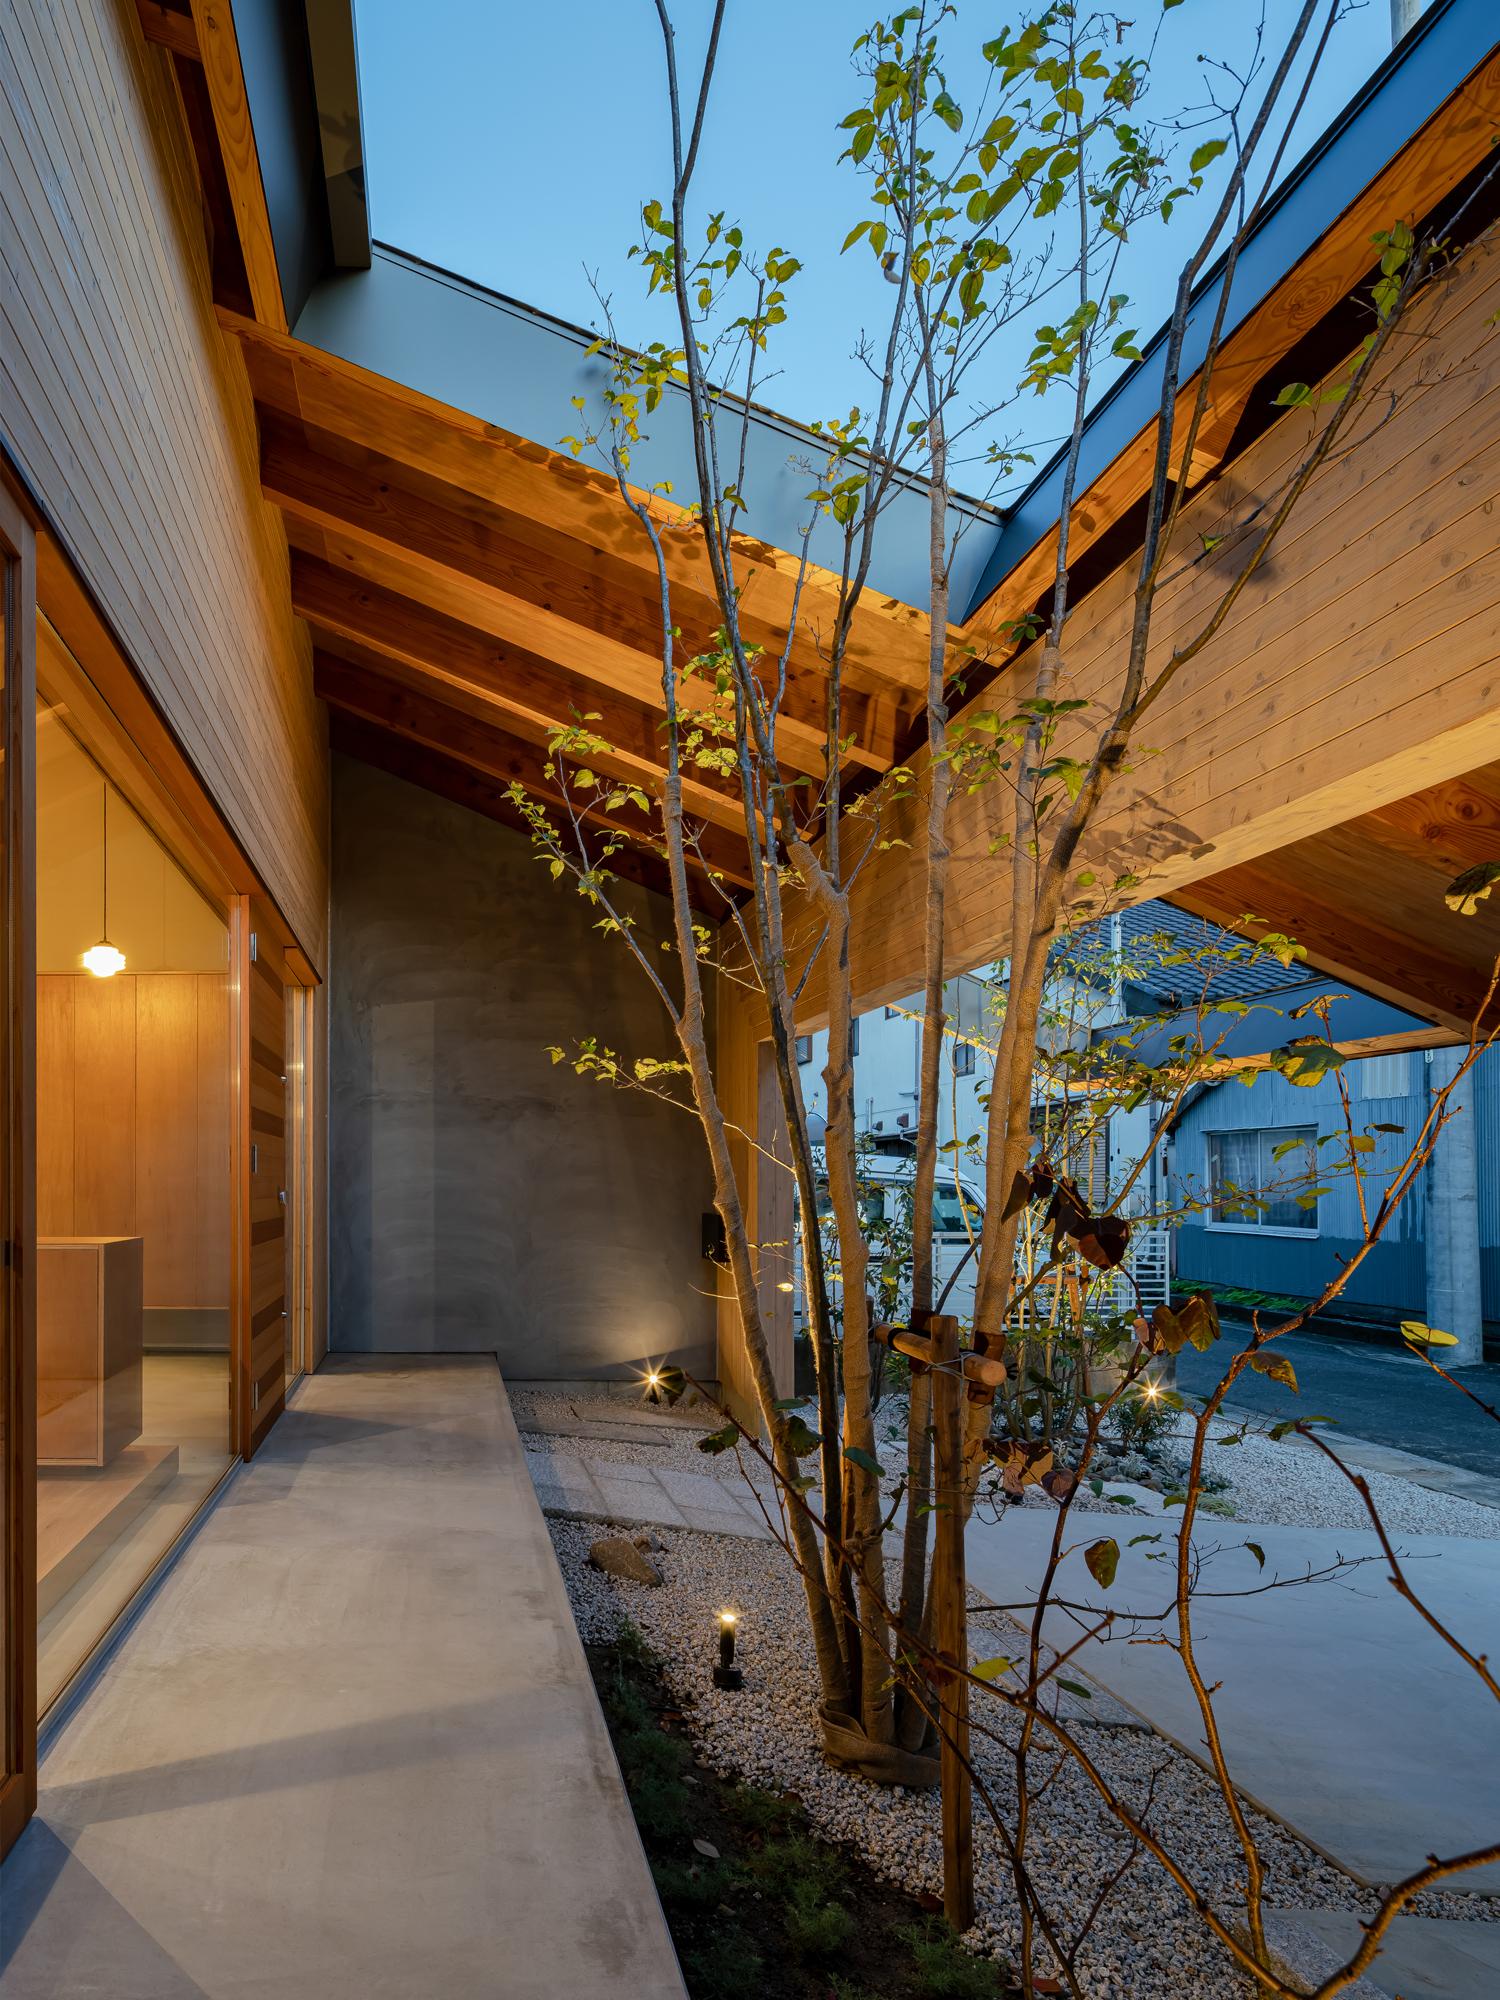 愛知・岐阜・三重・静岡・名古屋を中心に活動する建築家/建築設計事務所